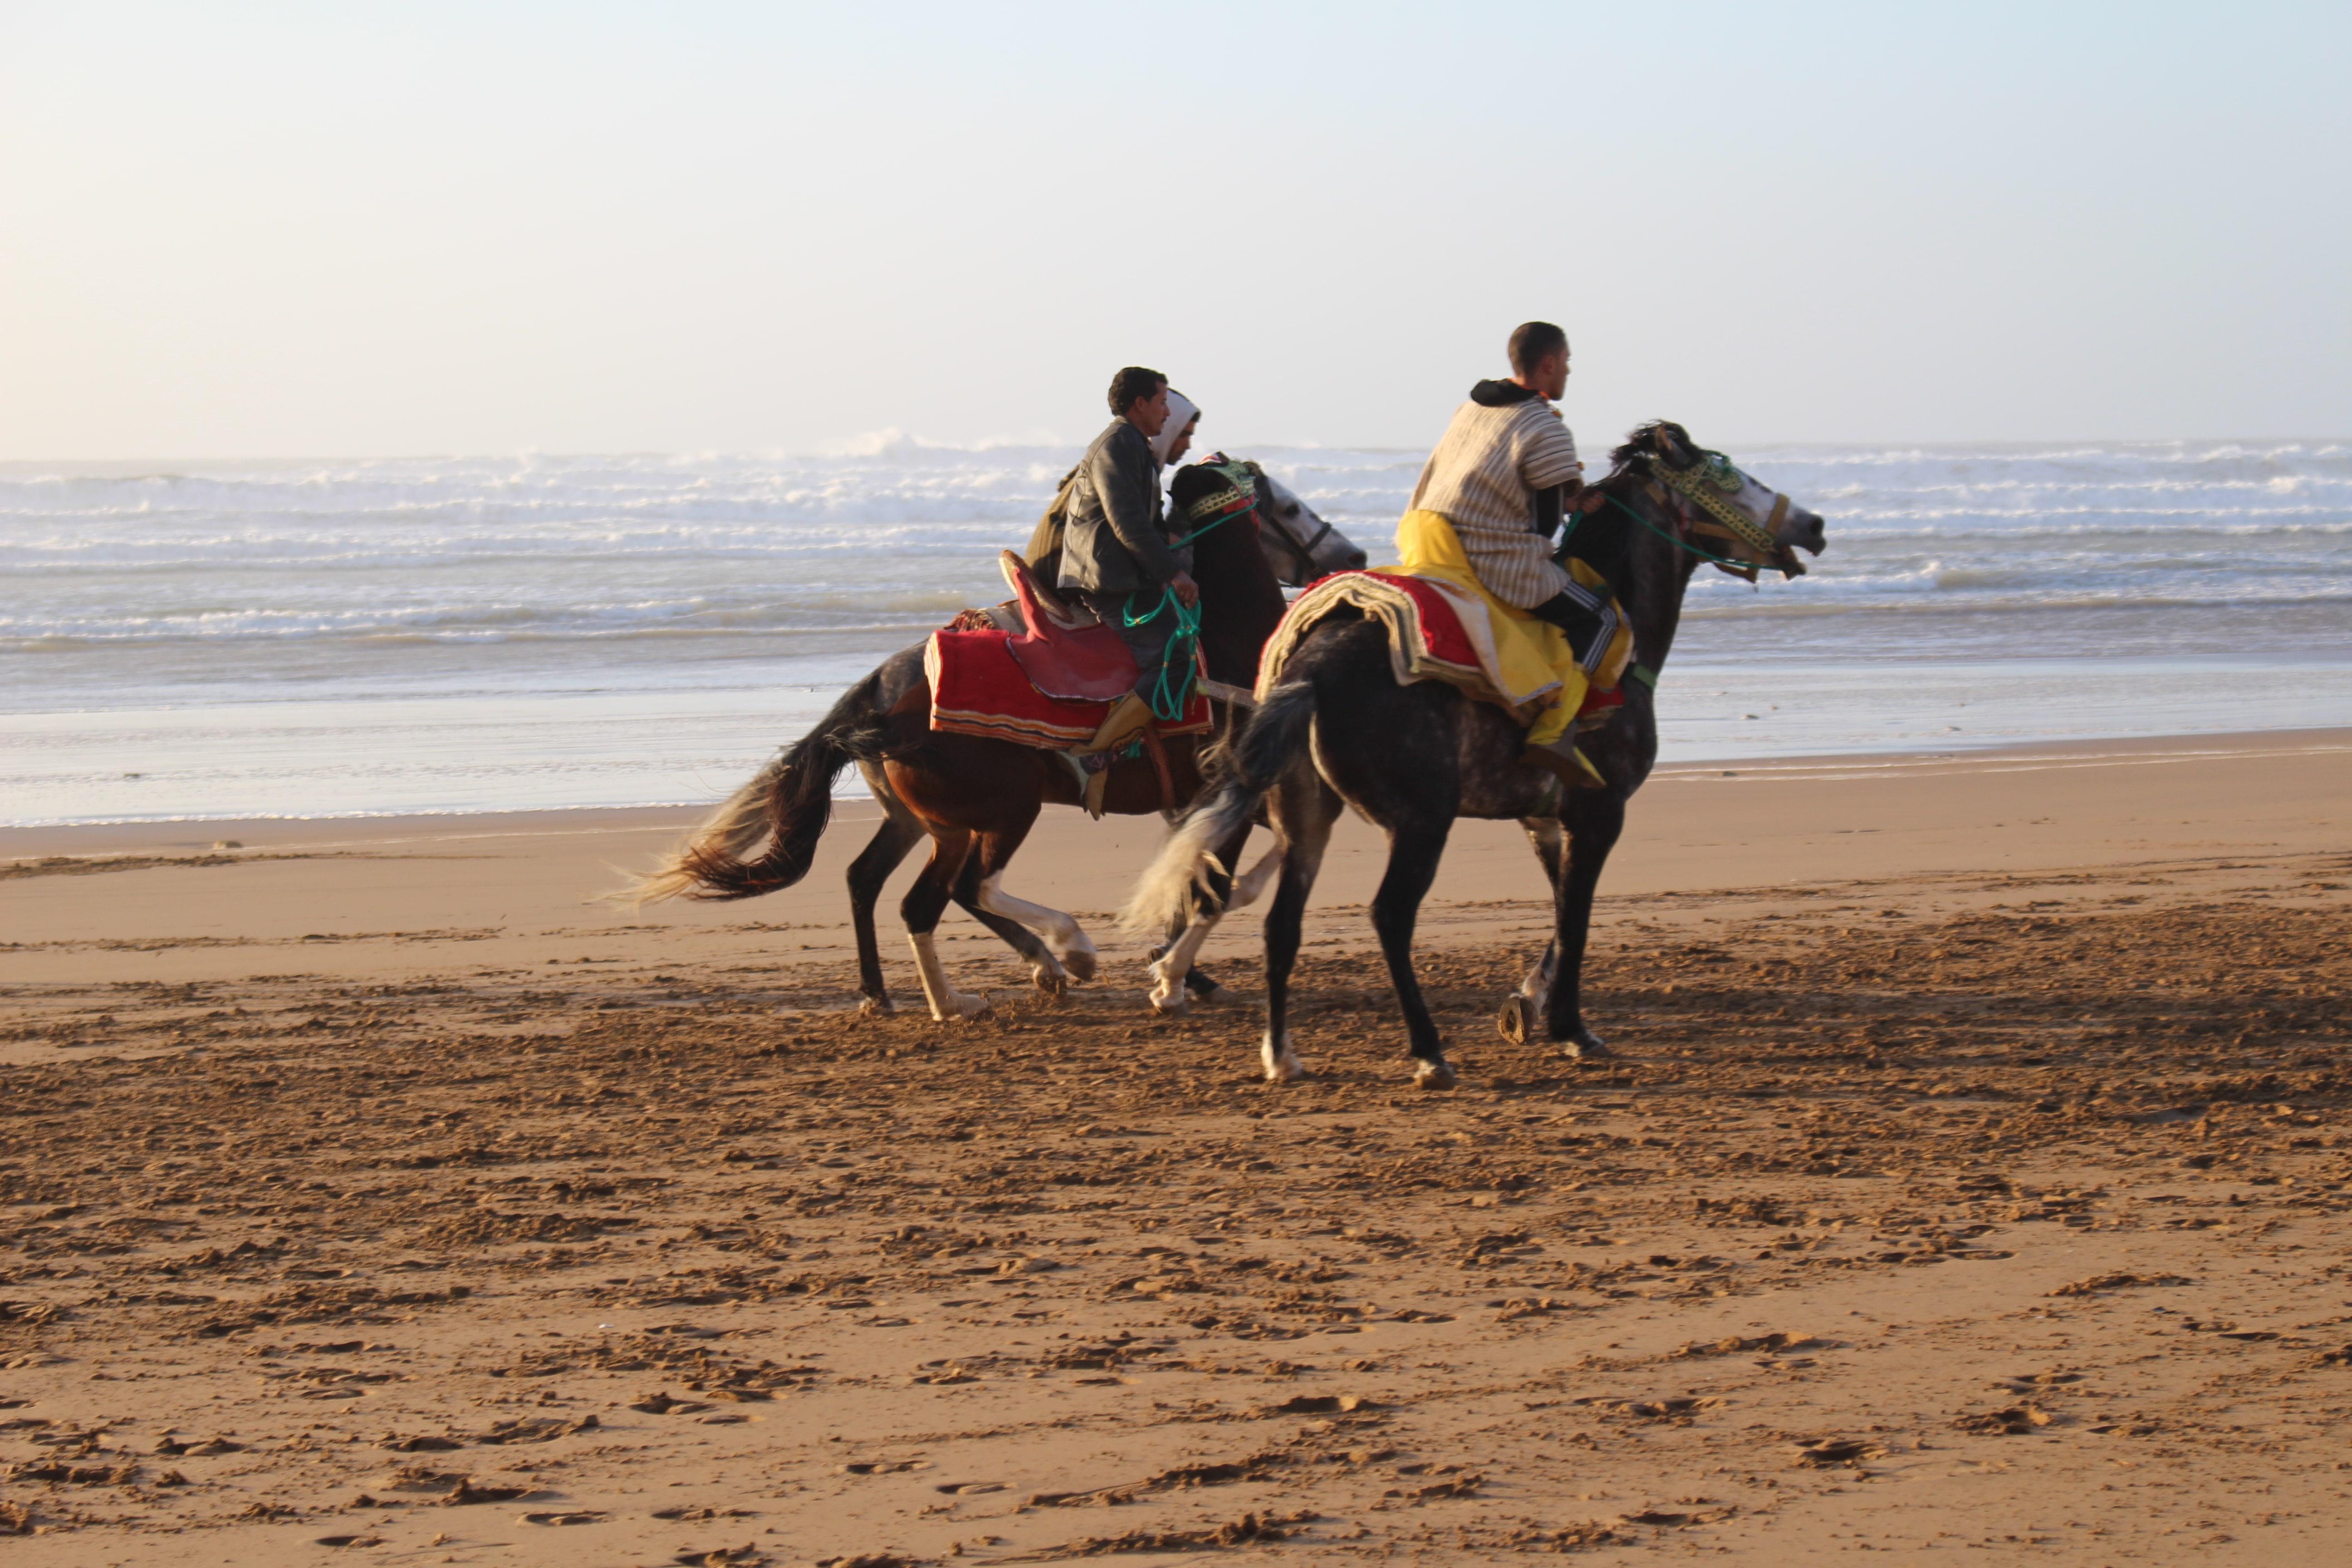 morocco-tours-fantasia-festival-www.moroccanjourneys.com